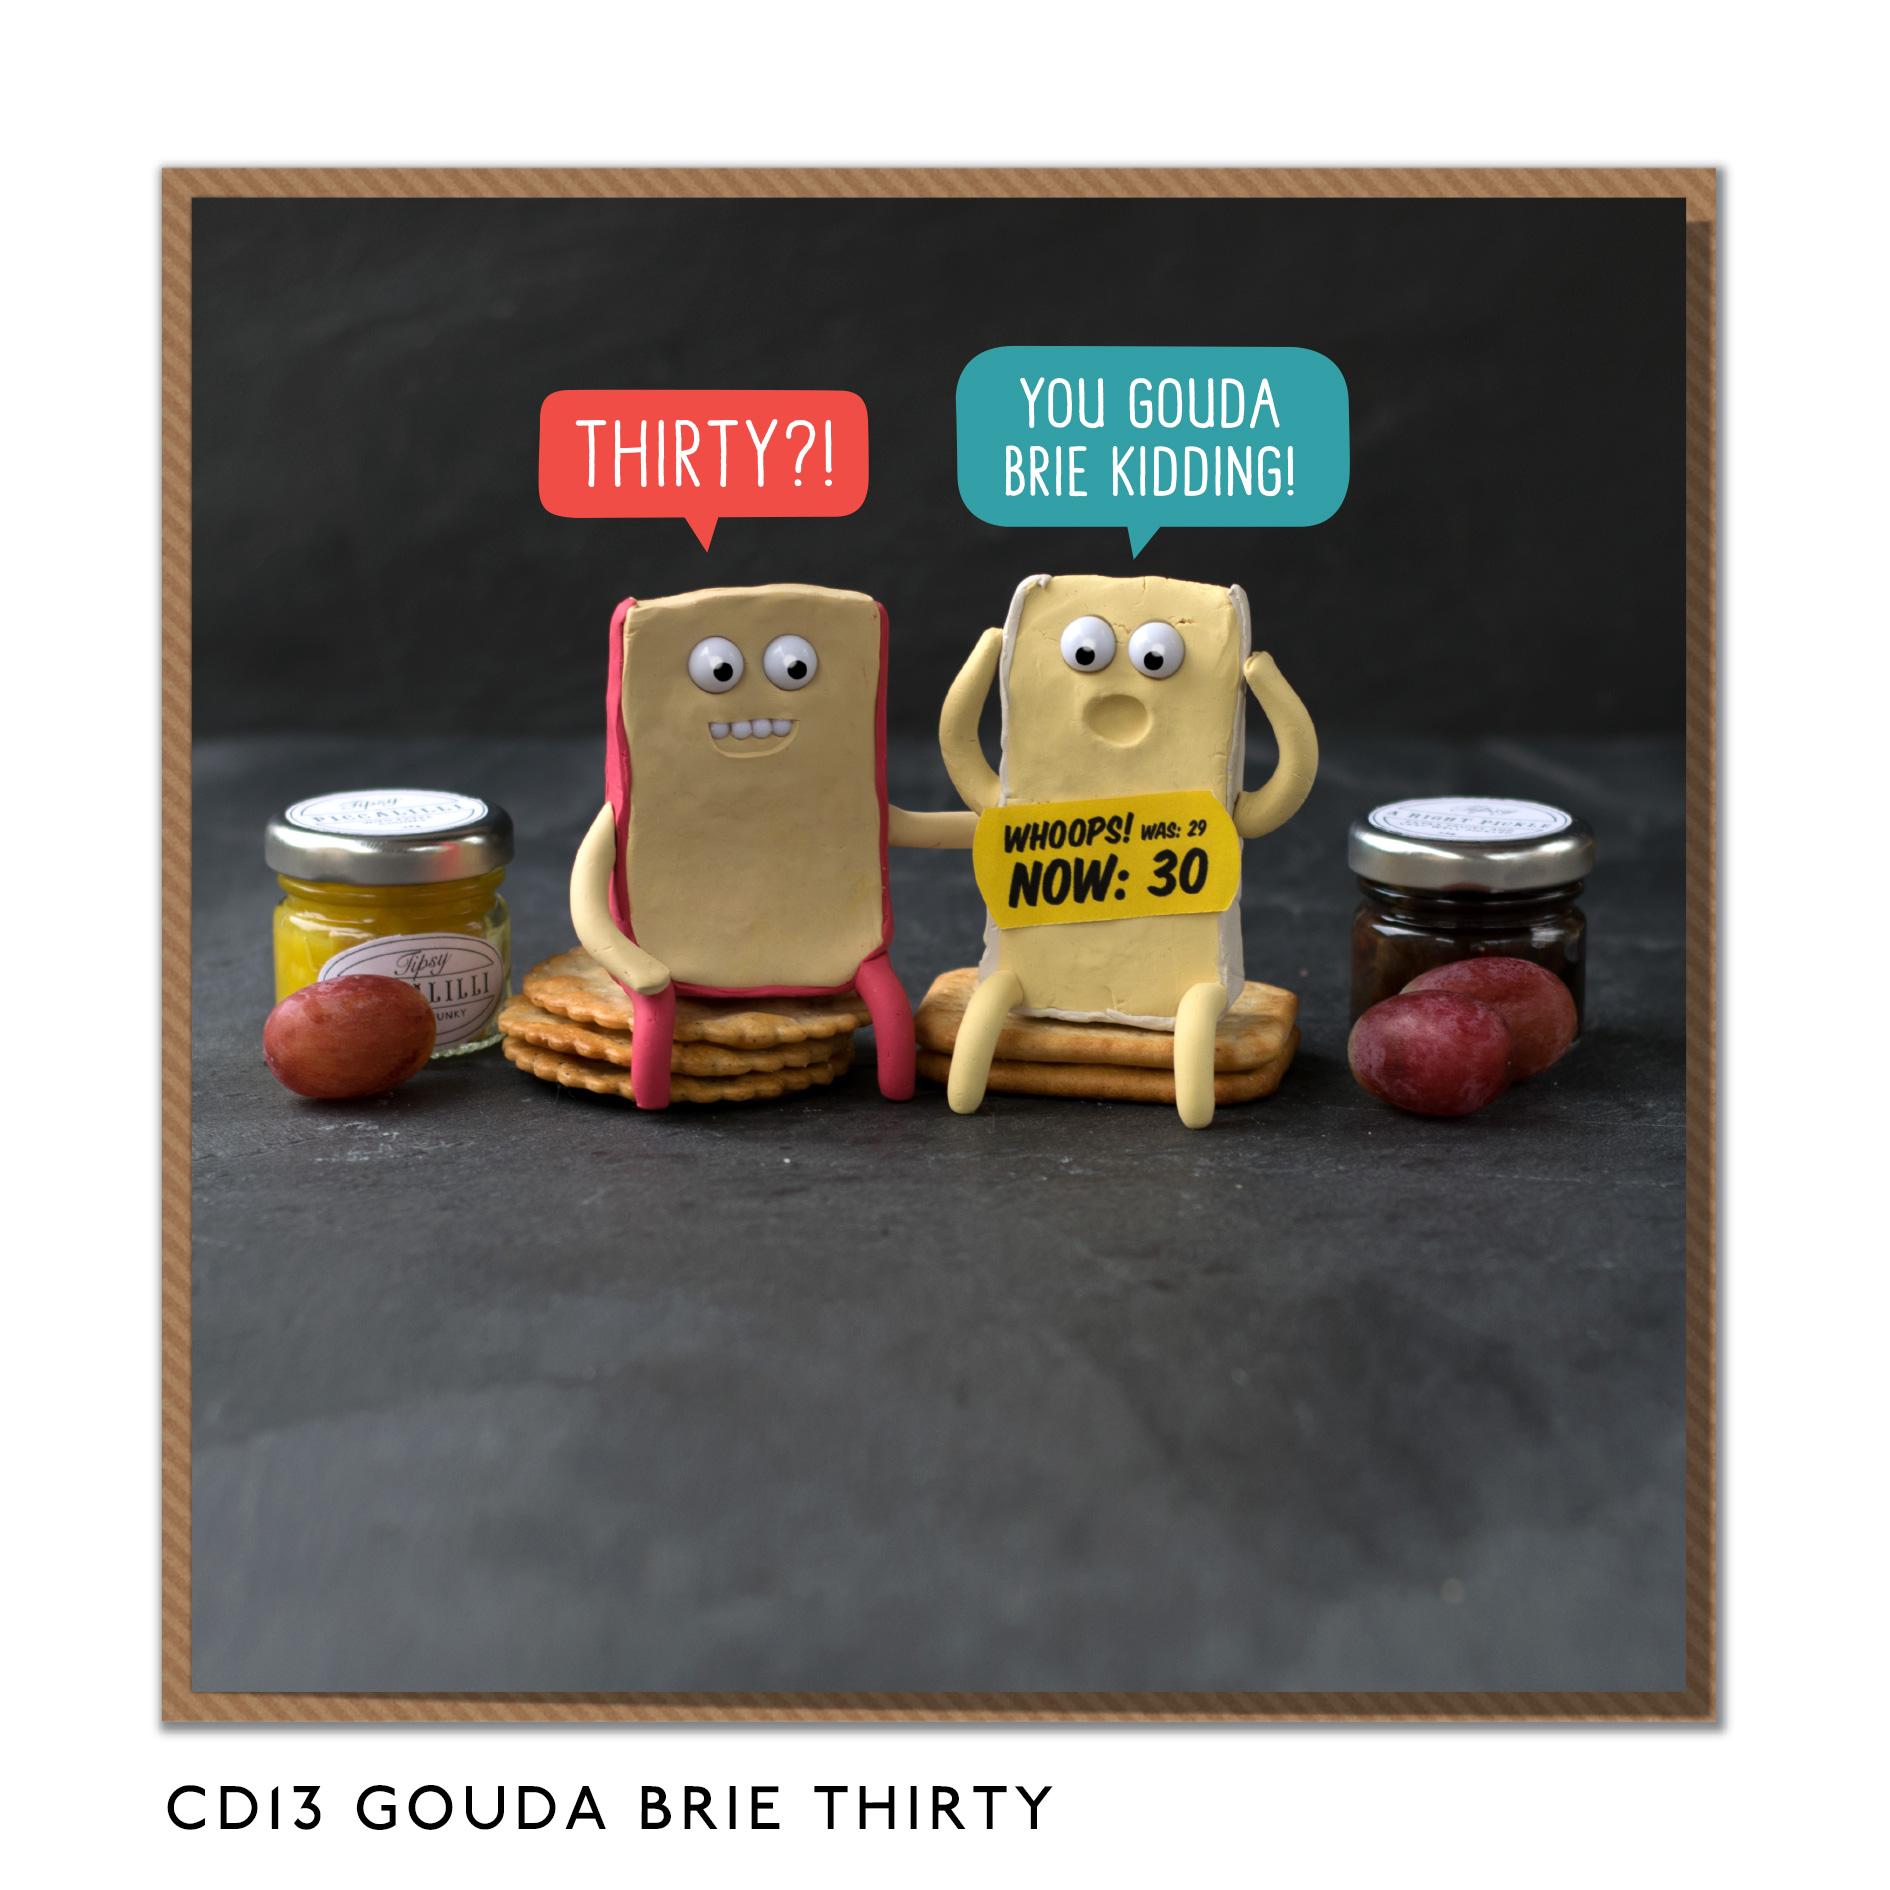 CD13-GOUDA-BRIE-THIRTY.jpg